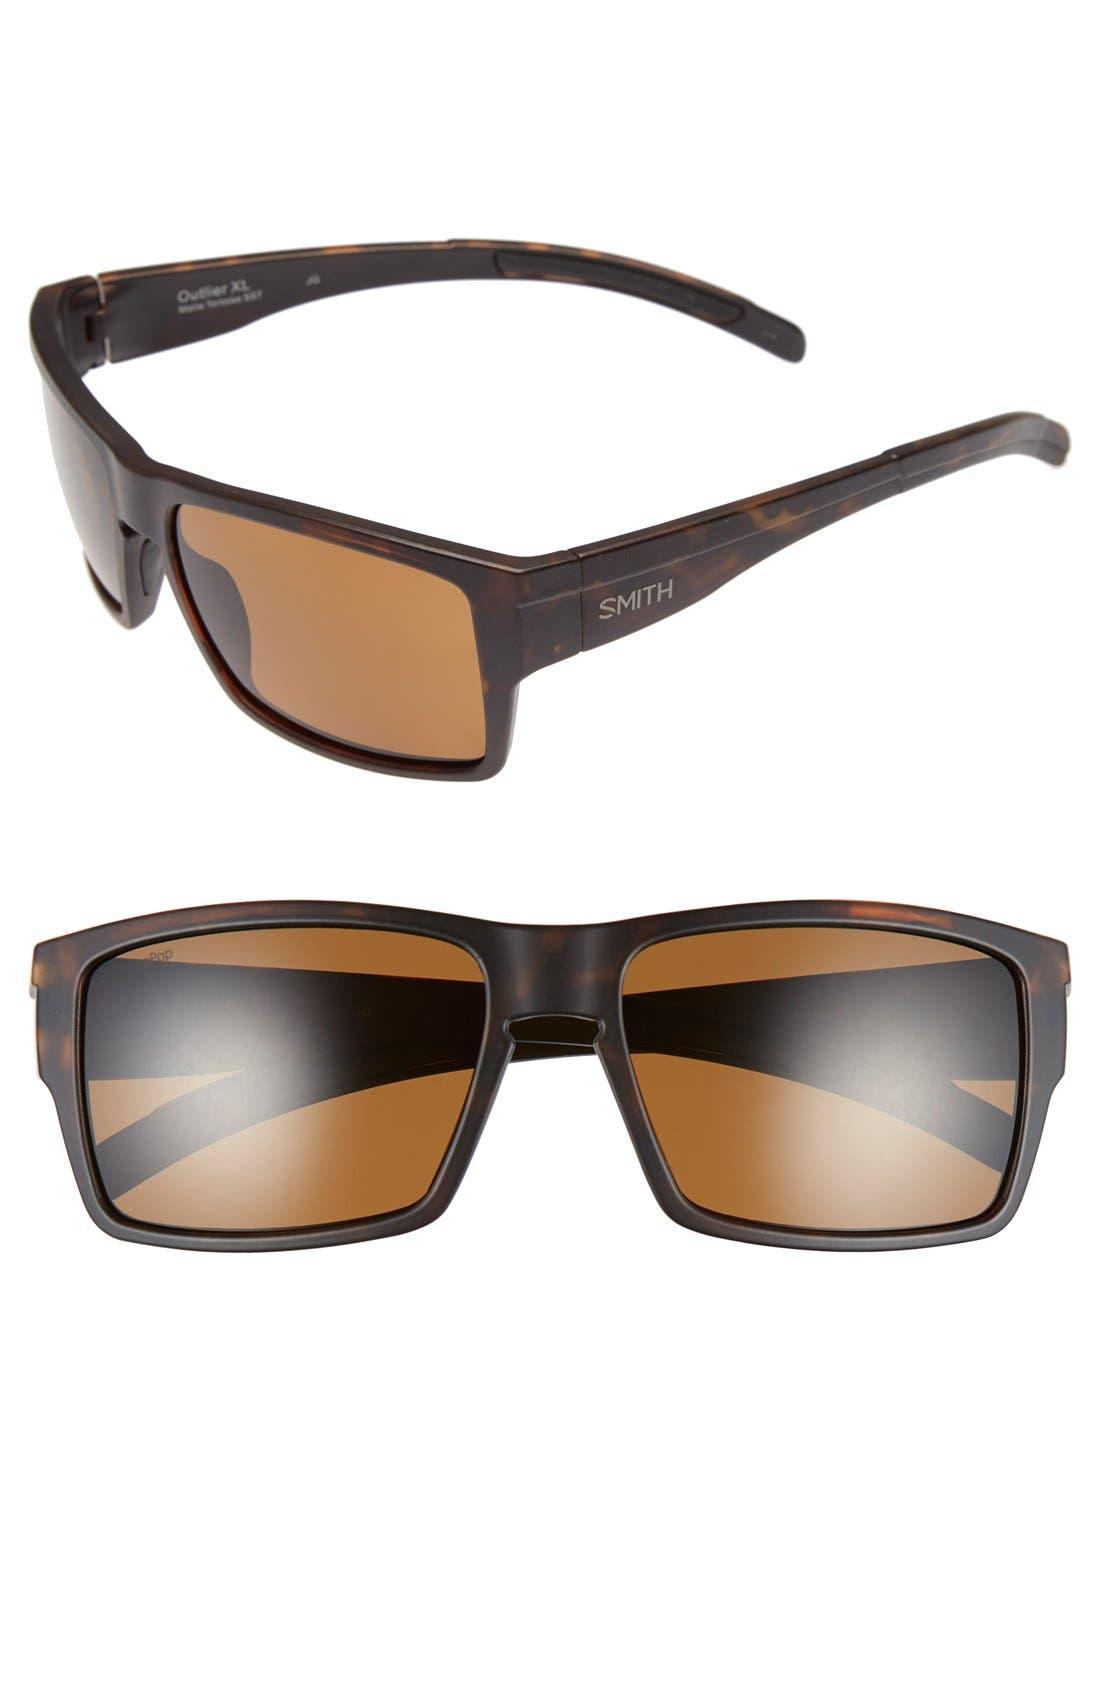 'Outlier XL' 56mm Polarized Sunglasses,                         Main,                         color, Matte Tortoise/ Polar Brown